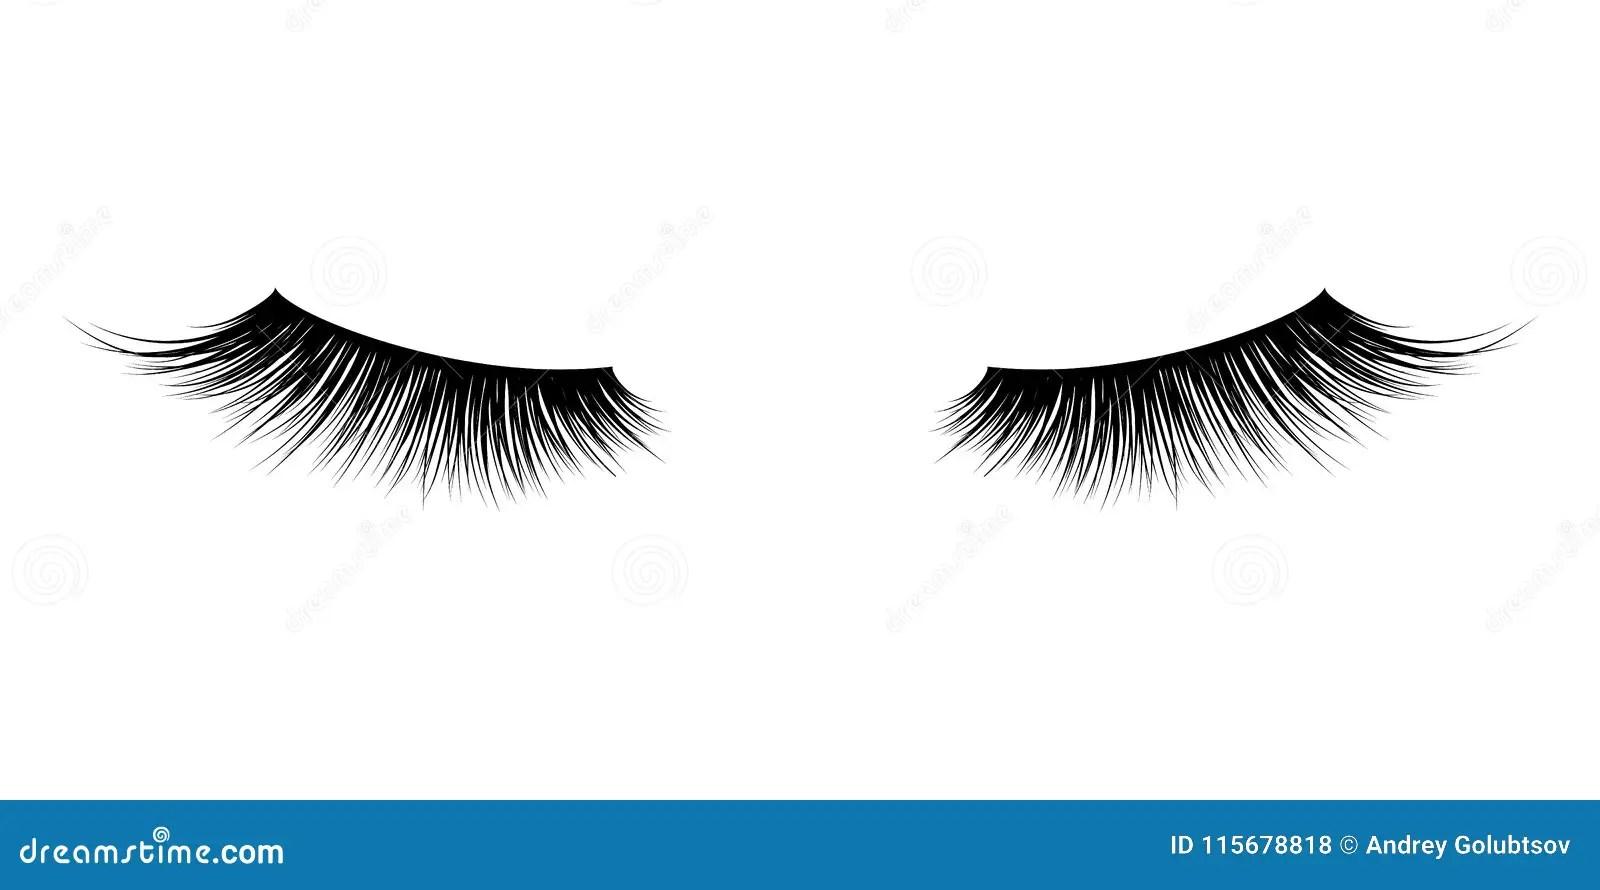 Eyelash Cartoons, Illustrations & Vector Stock Images